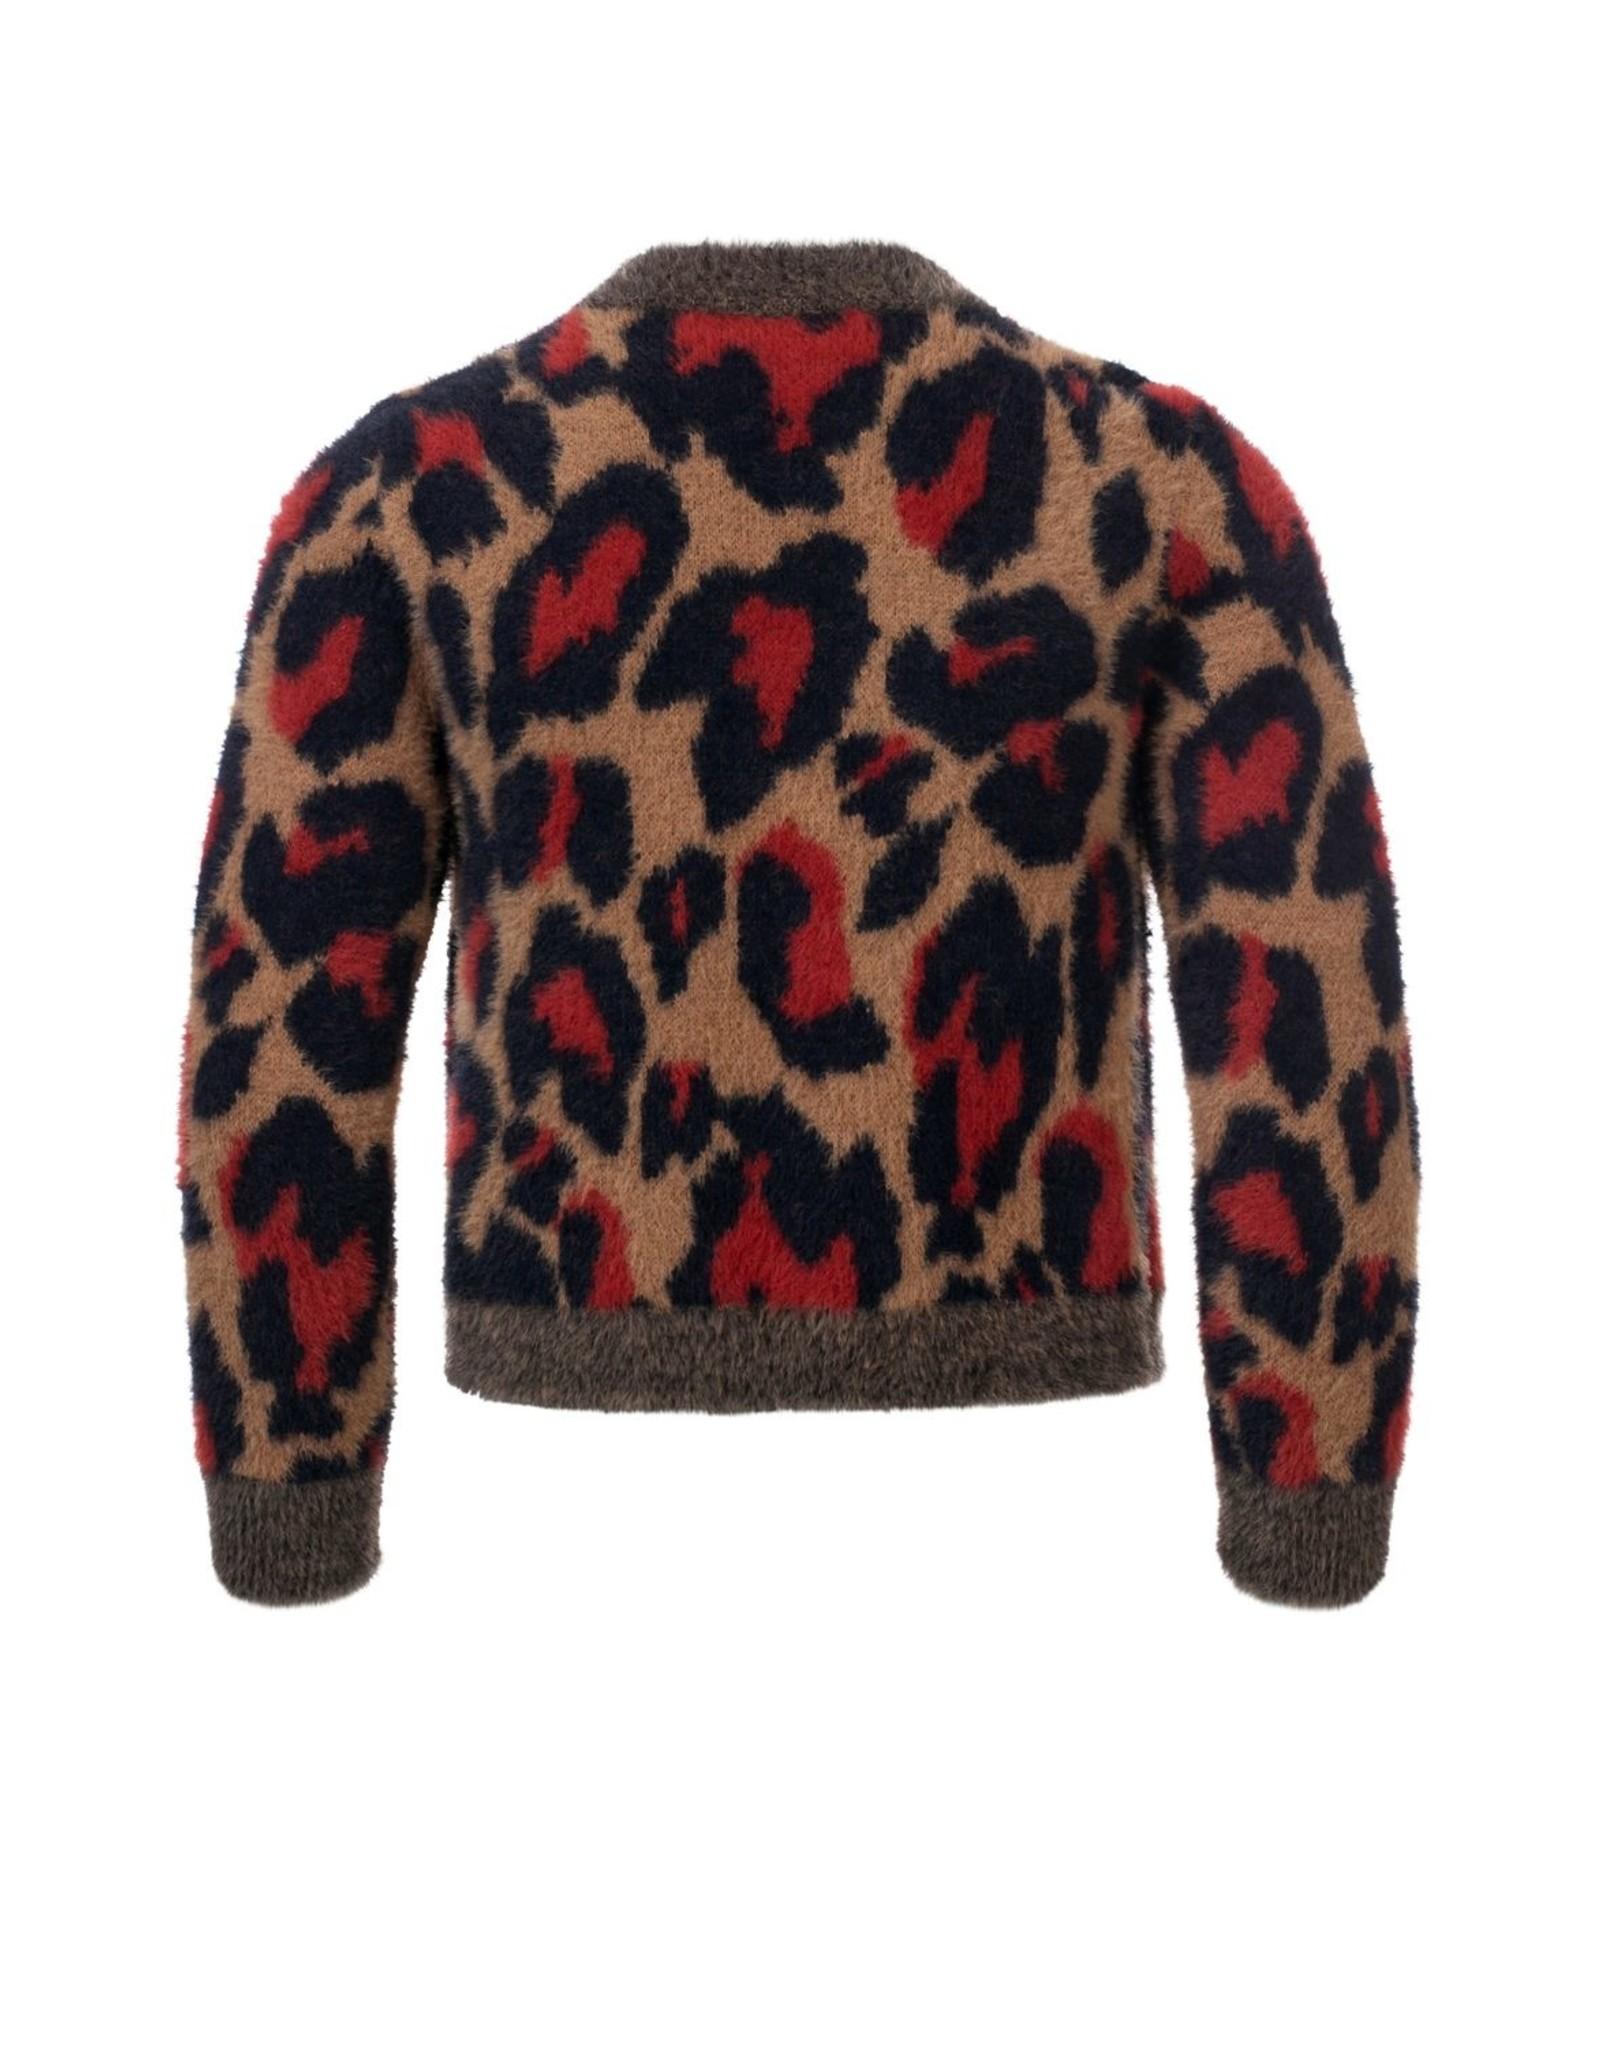 Looxs 10SIXTEEN Girls knitted cardigan maat 128